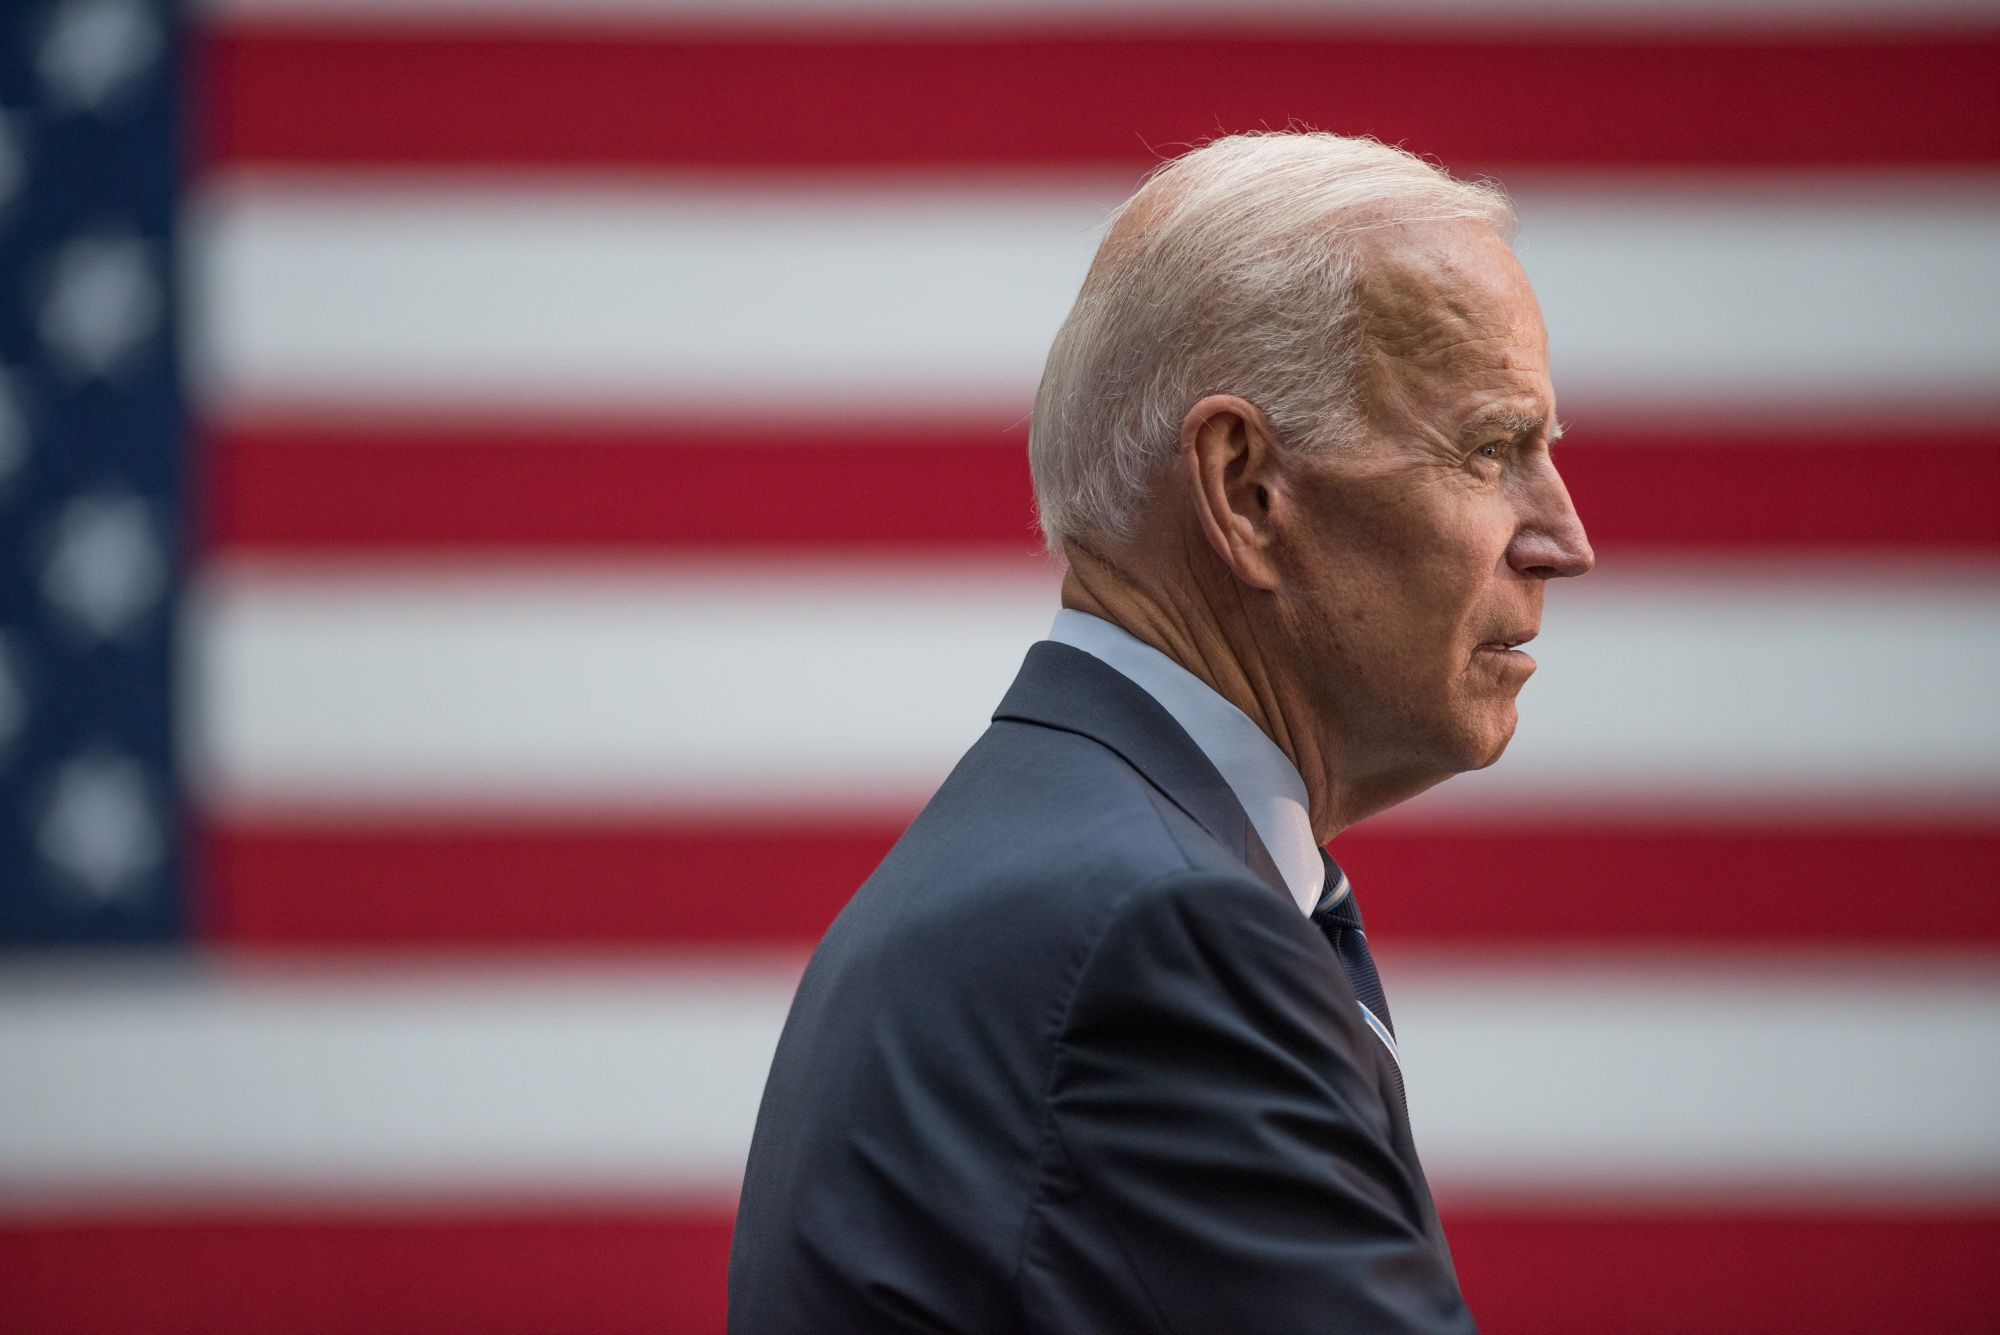 Biden, Booker Appear at Urban League Convention: Campaign Update